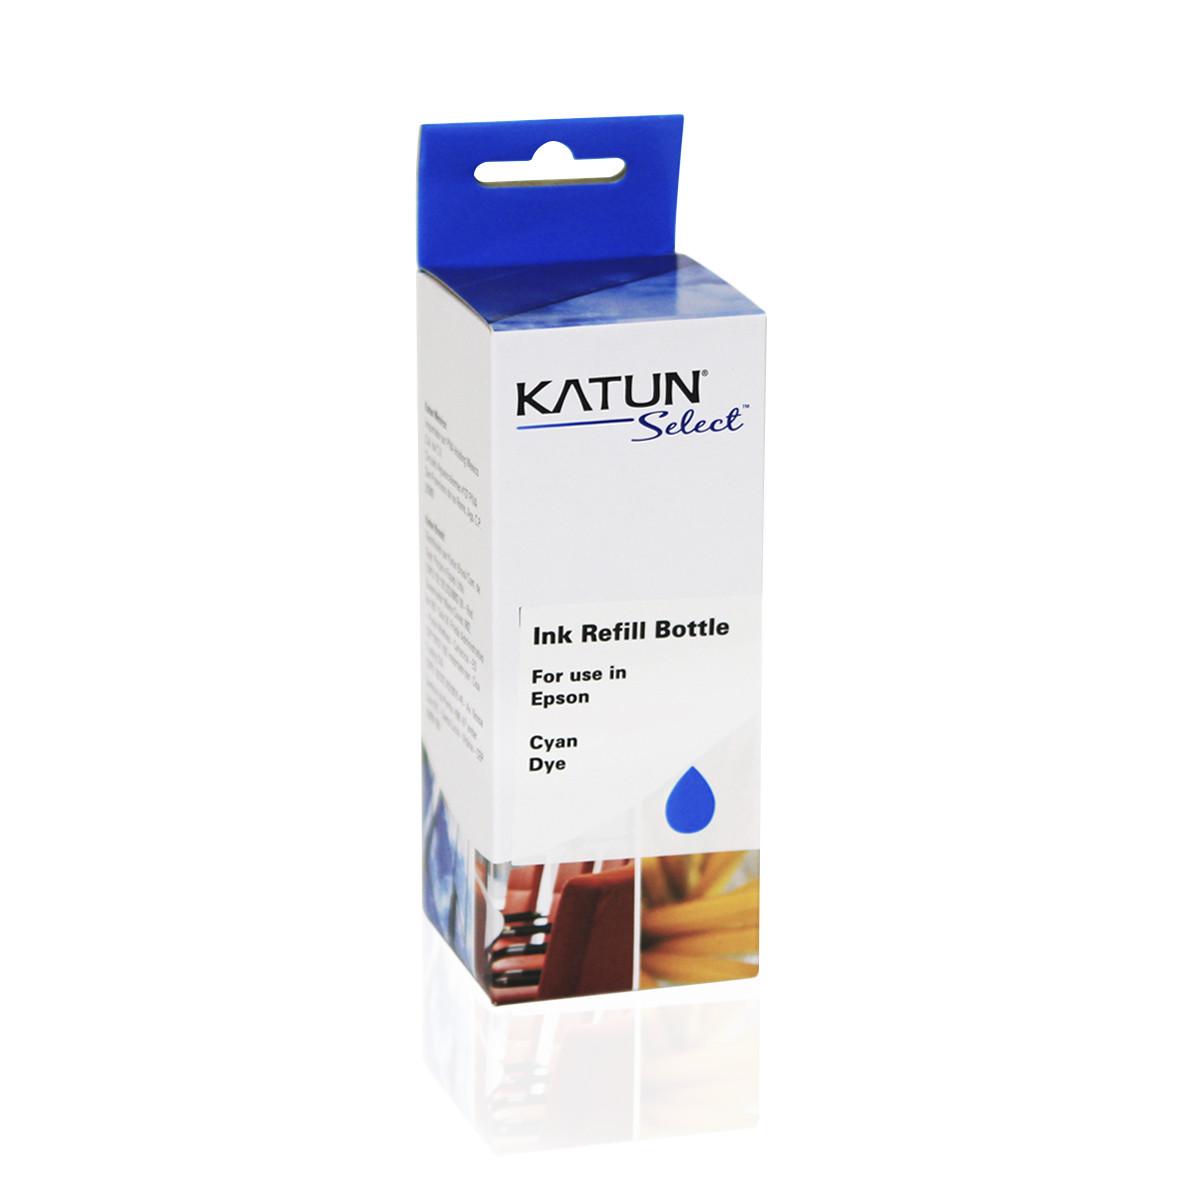 Tinta Compatível com Epson T504 T504220 Ciano | L4150 L4160 L6171 L6191 L6161 | Katun Select 70ml